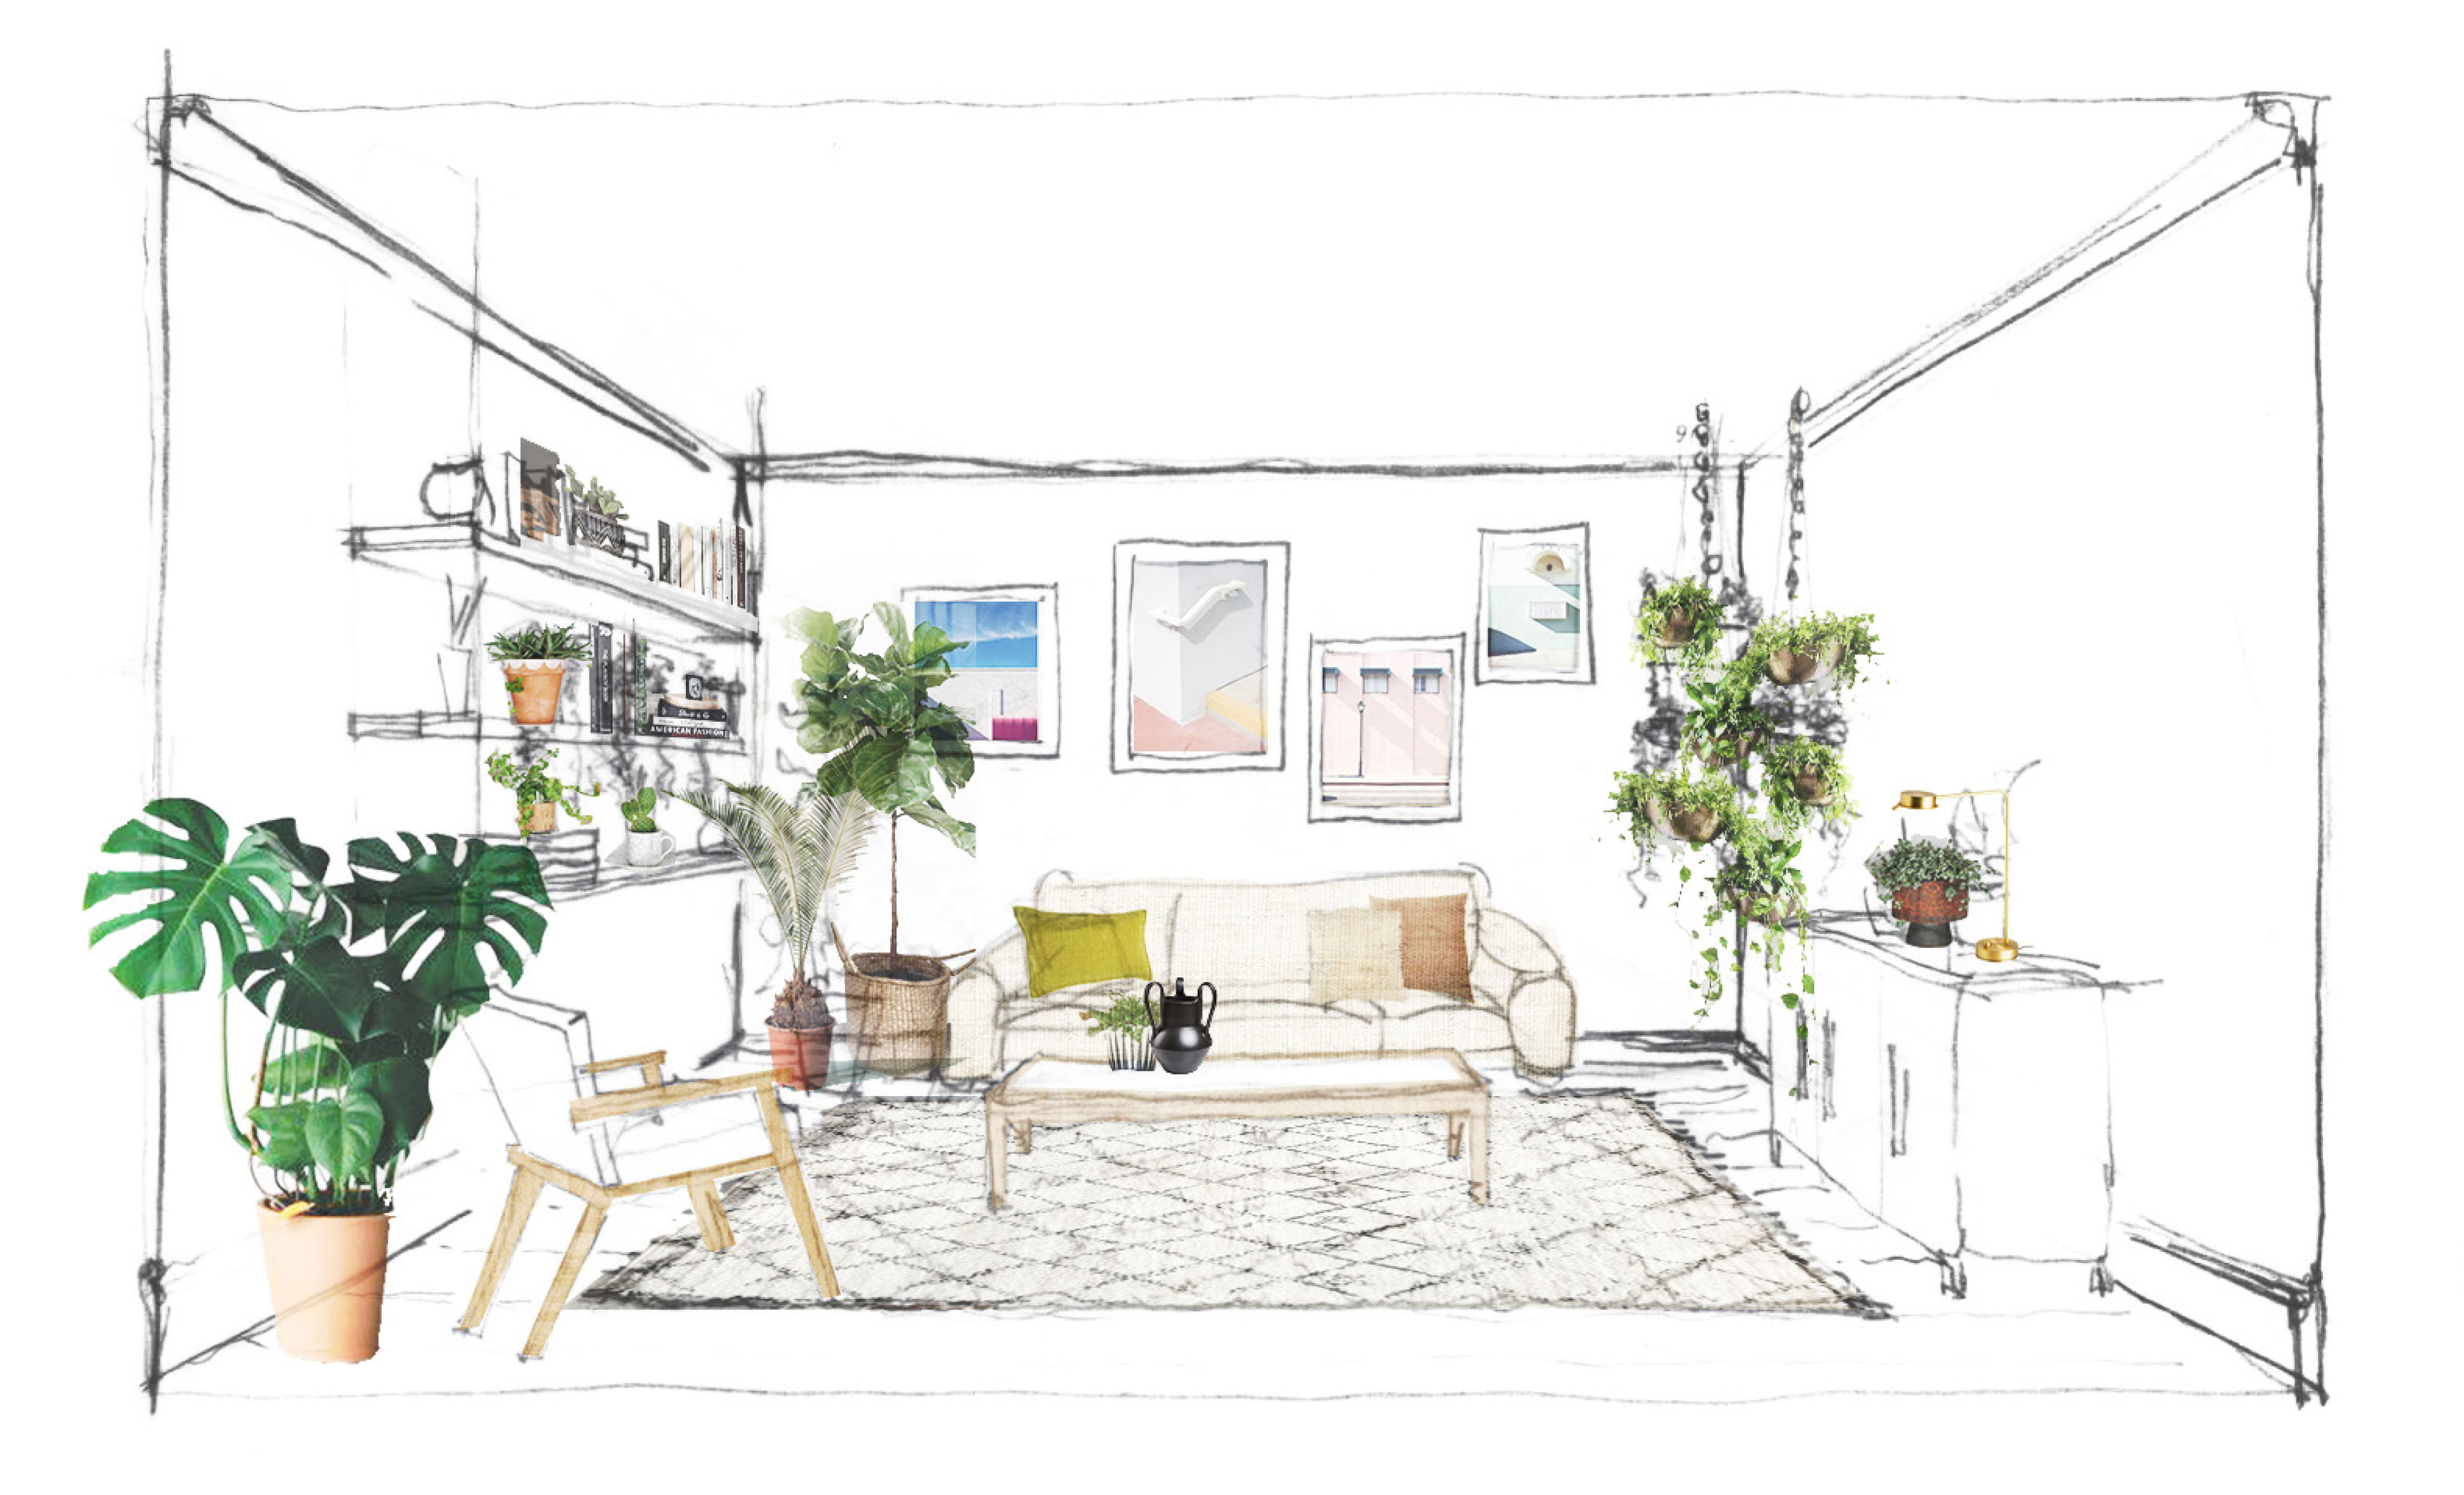 FLAT 15 Styled Room-Room Sketch